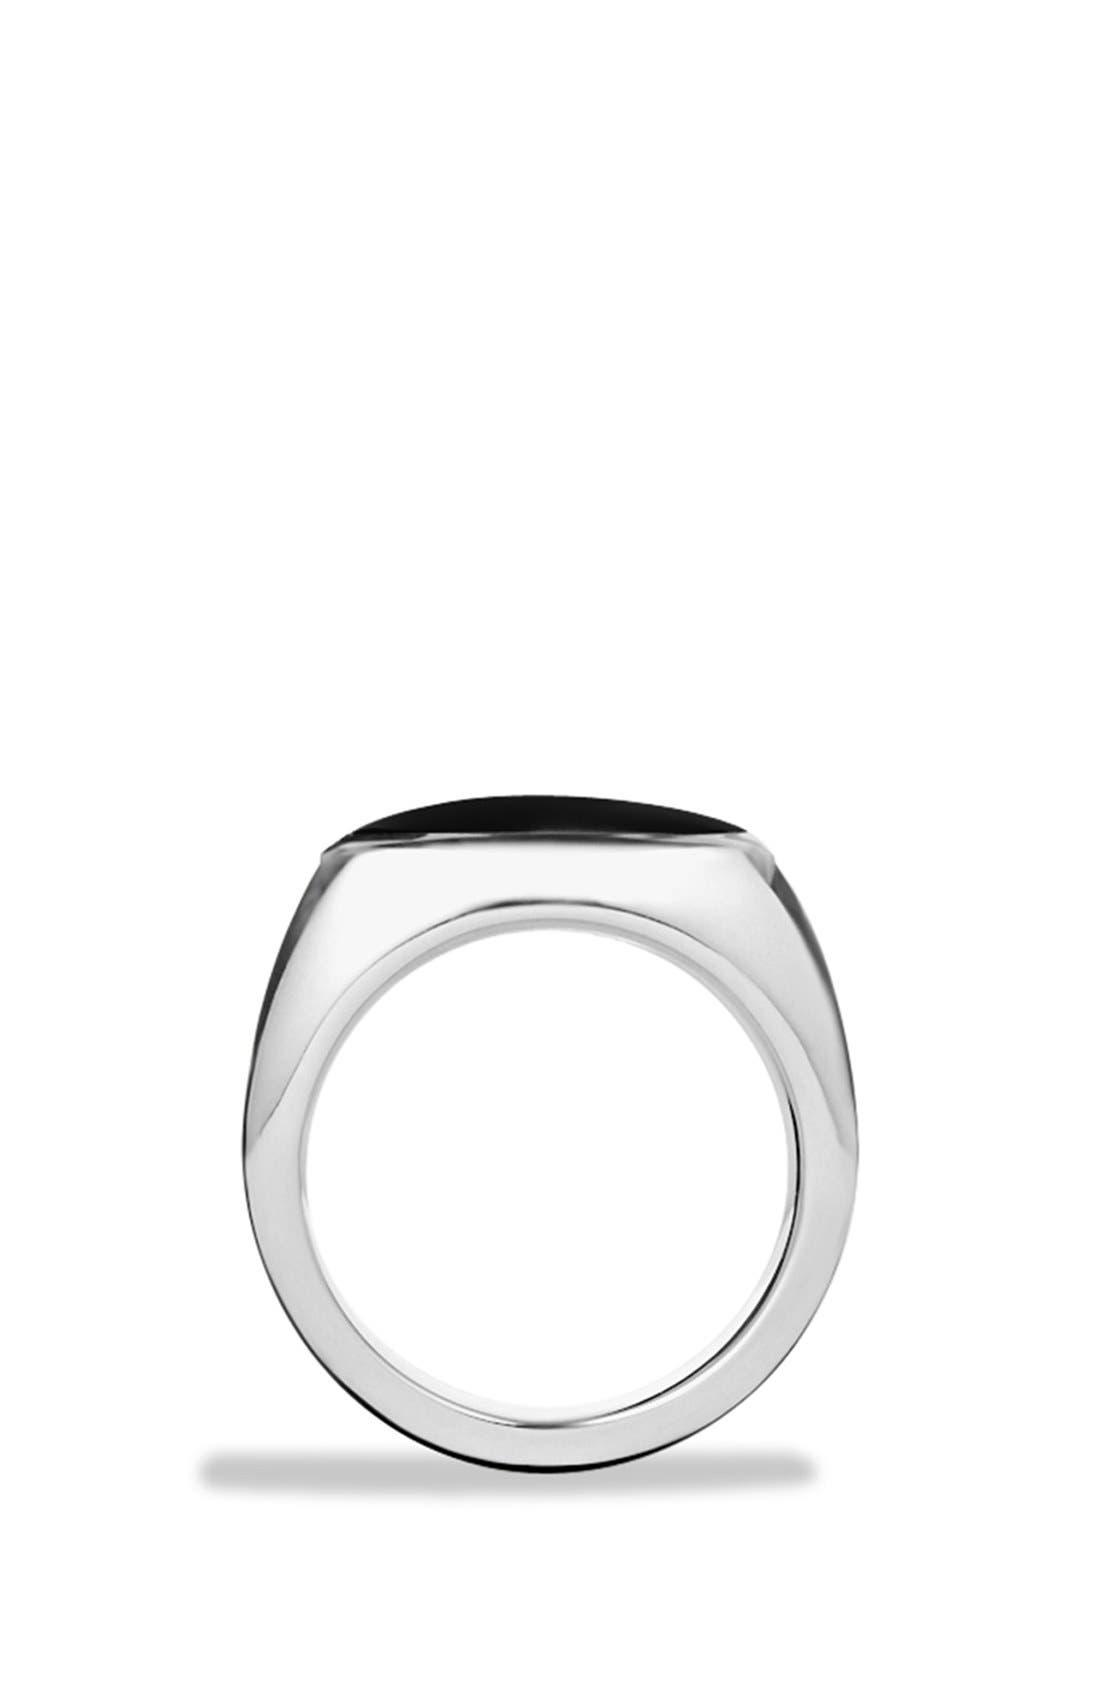 'Royal Cord' Knife Edge Signet Ring with Black Onyx,                             Alternate thumbnail 2, color,                             Black Onyx